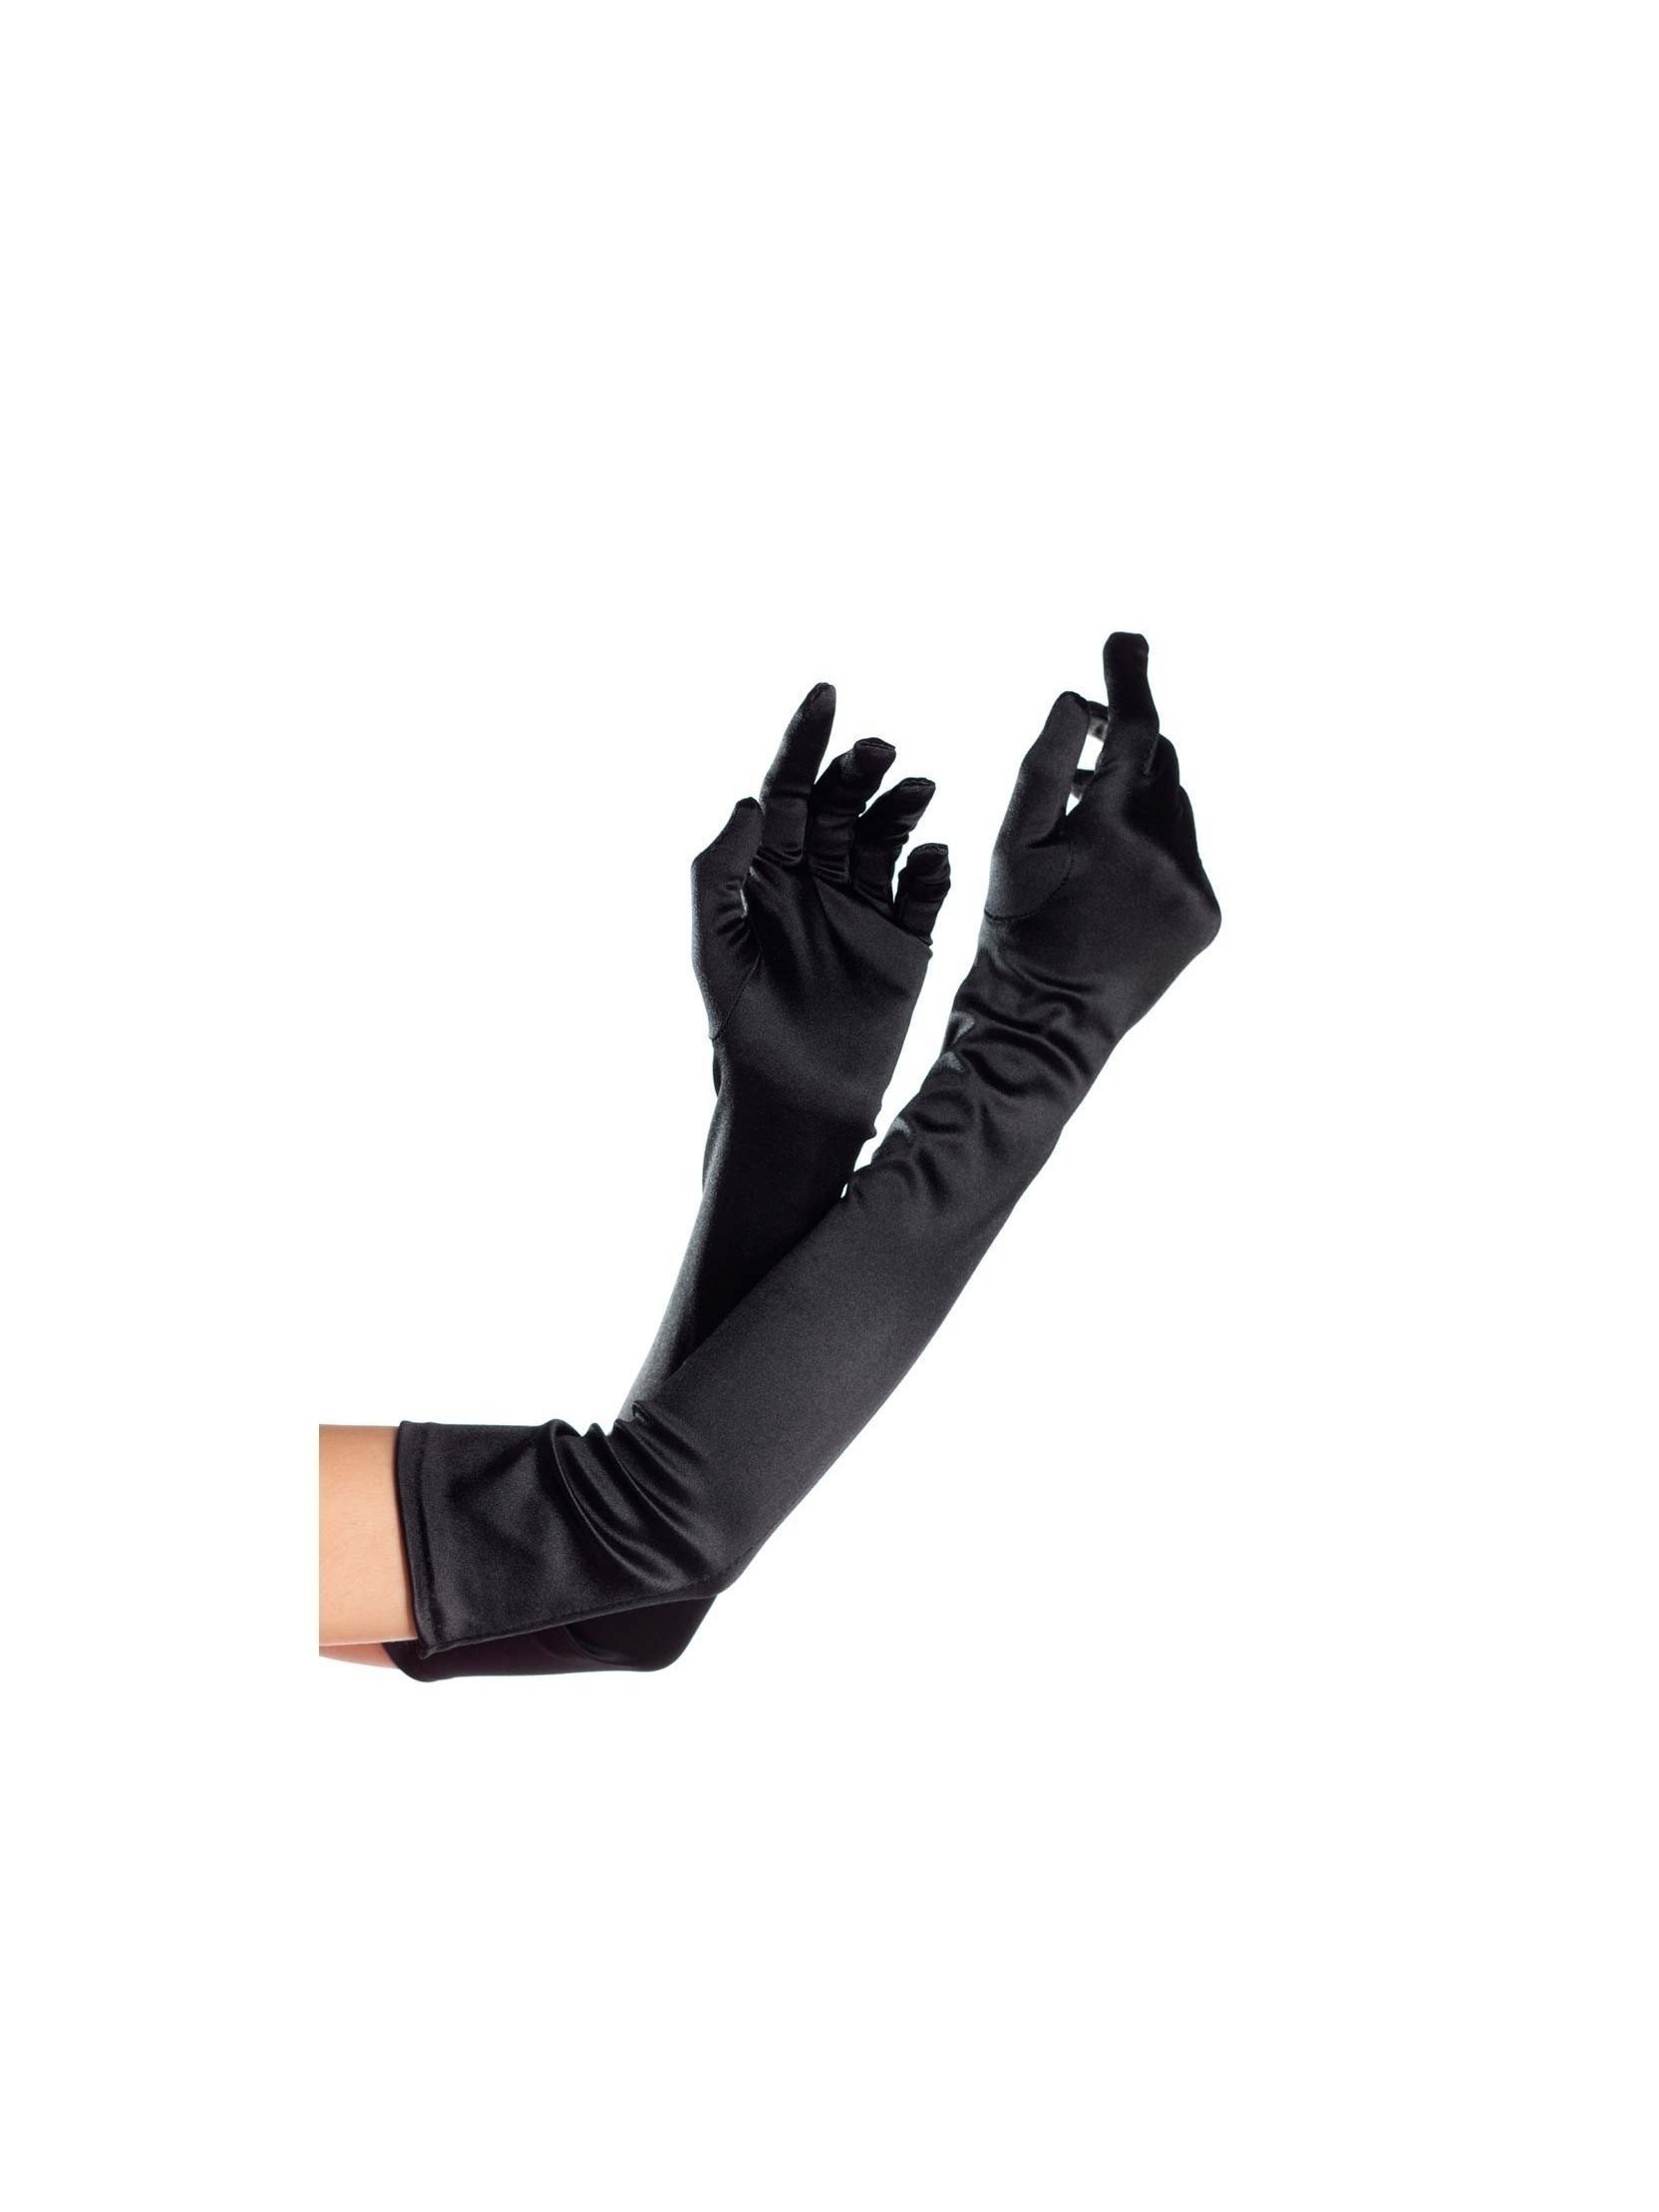 Be Wicked BW8812 Spandex Gloves Black / 21cm